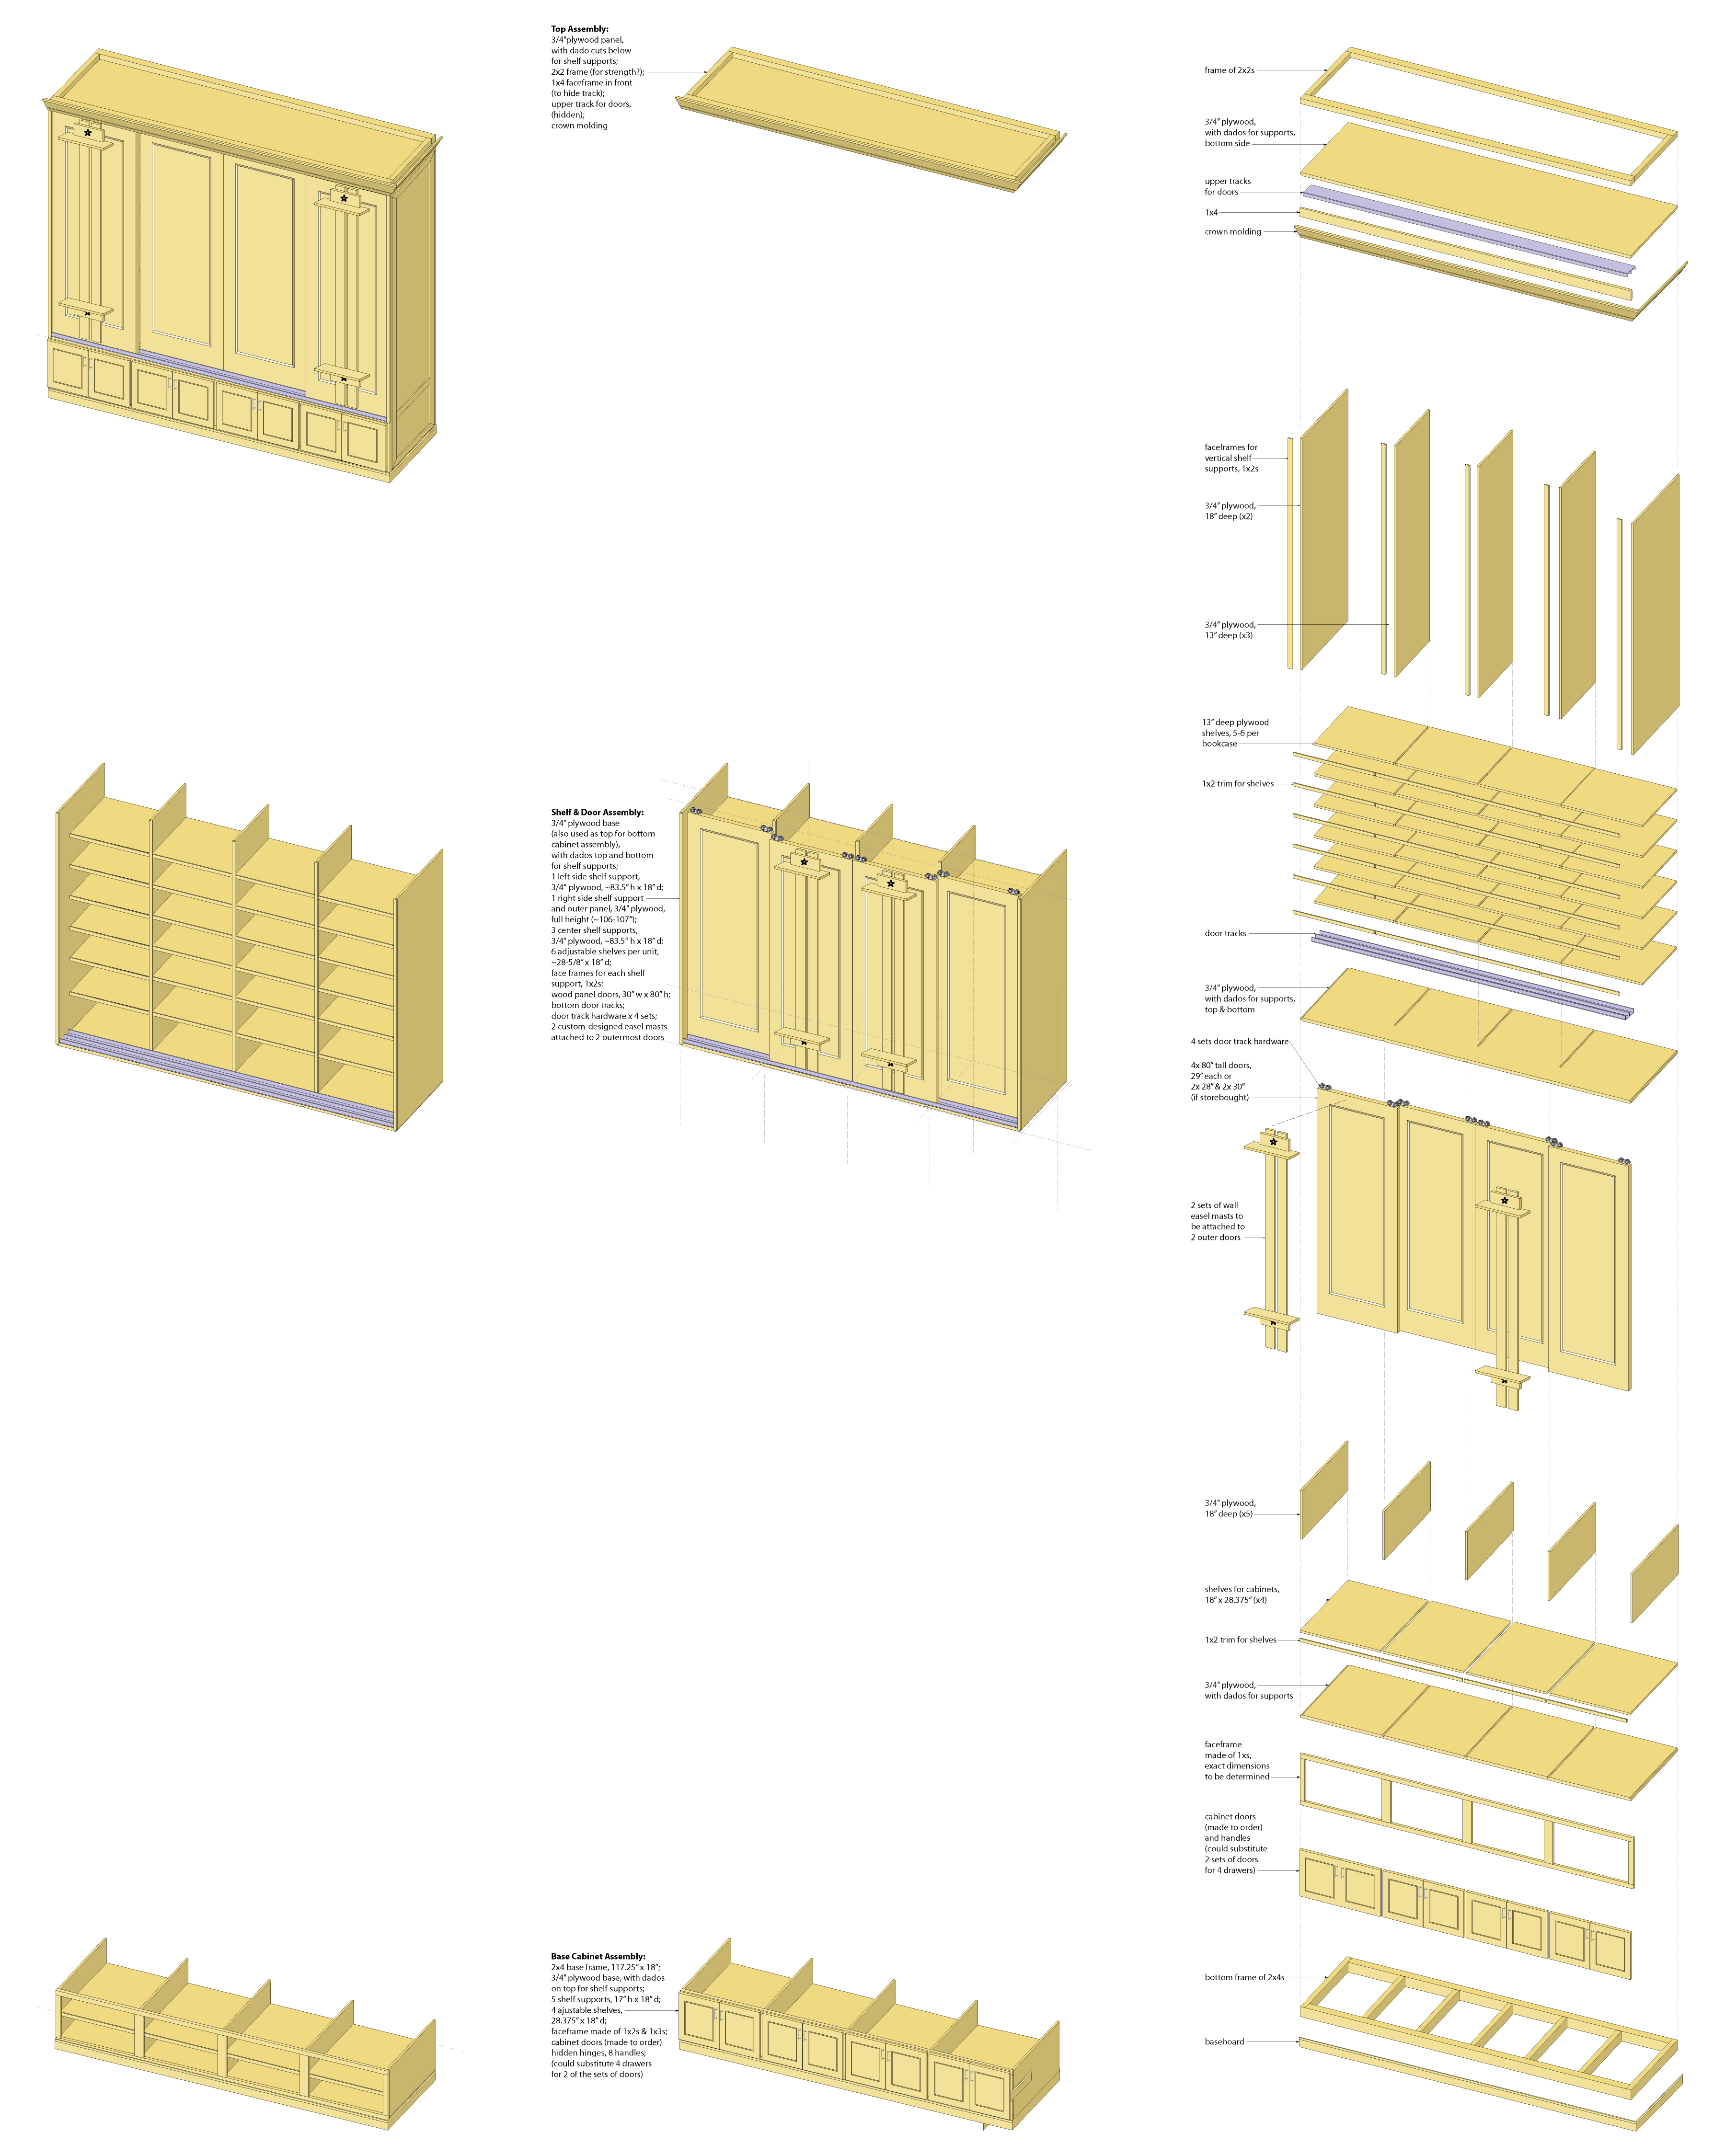 Interior Illustration-Studio Shelving System, base cabinet unit-sub-assemblies